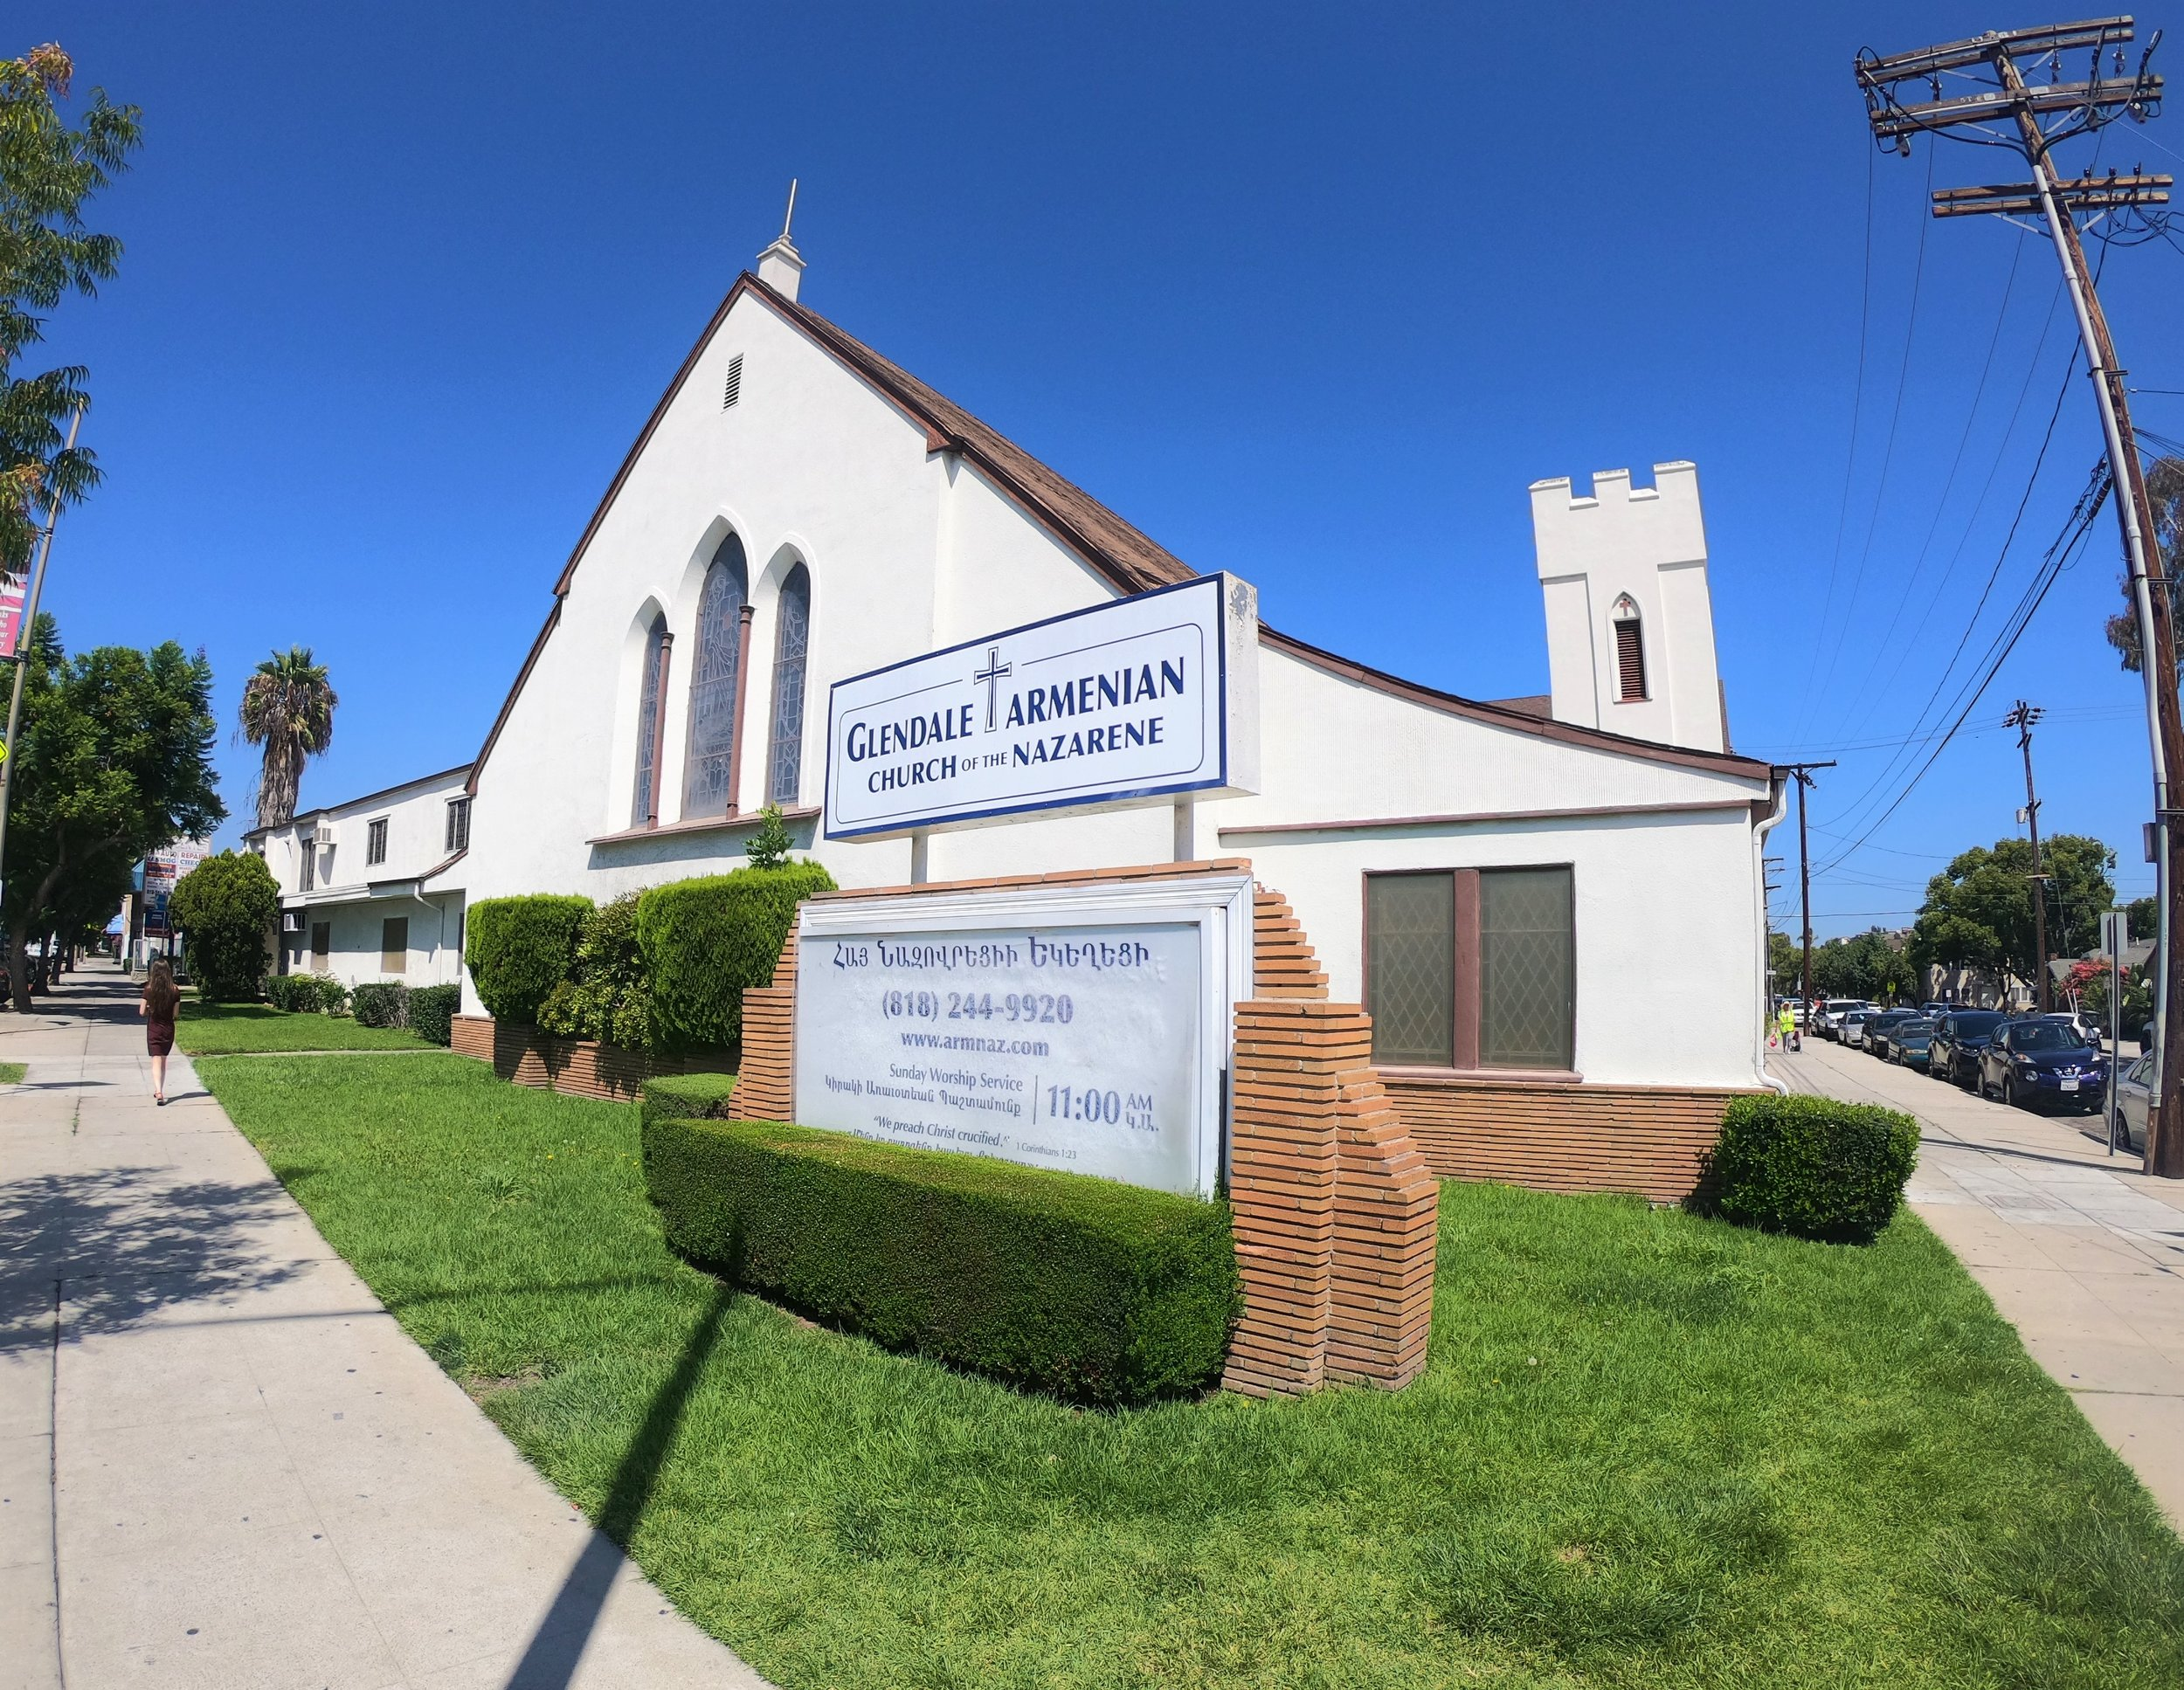 Armenian Church of the Nazarene in Glendale, California